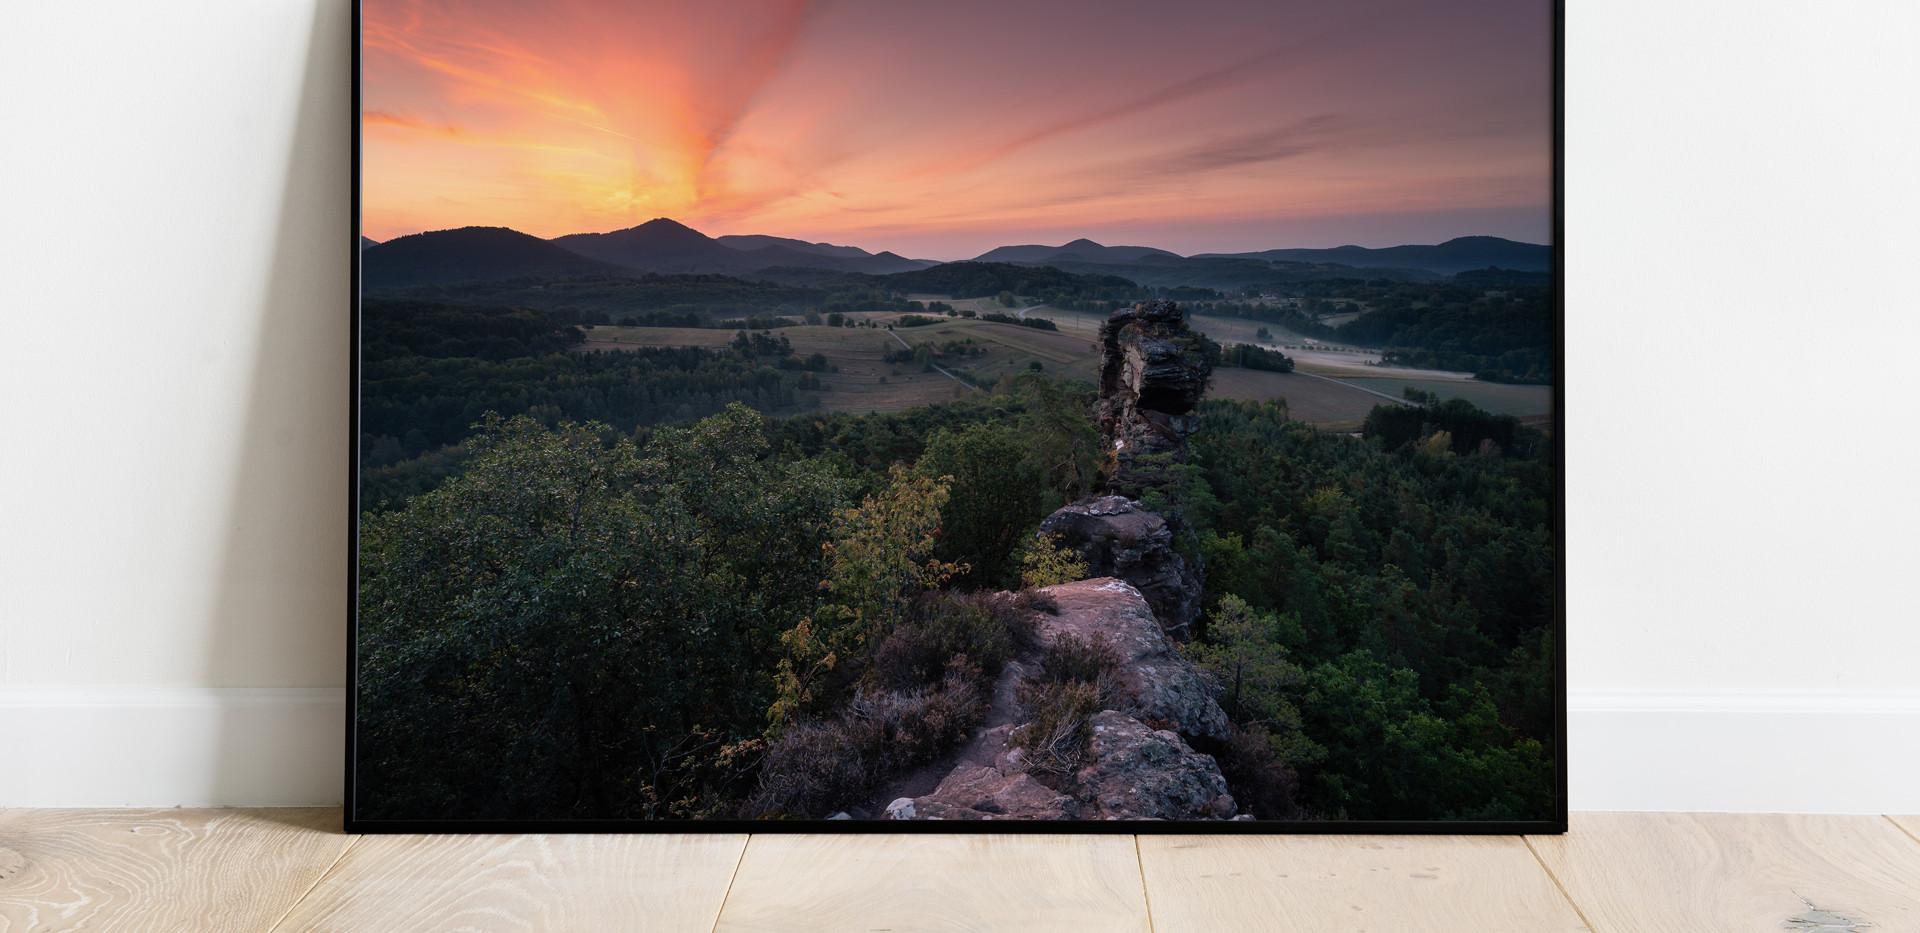 pfaelzerwald-sunrise-morgenrot.jpg